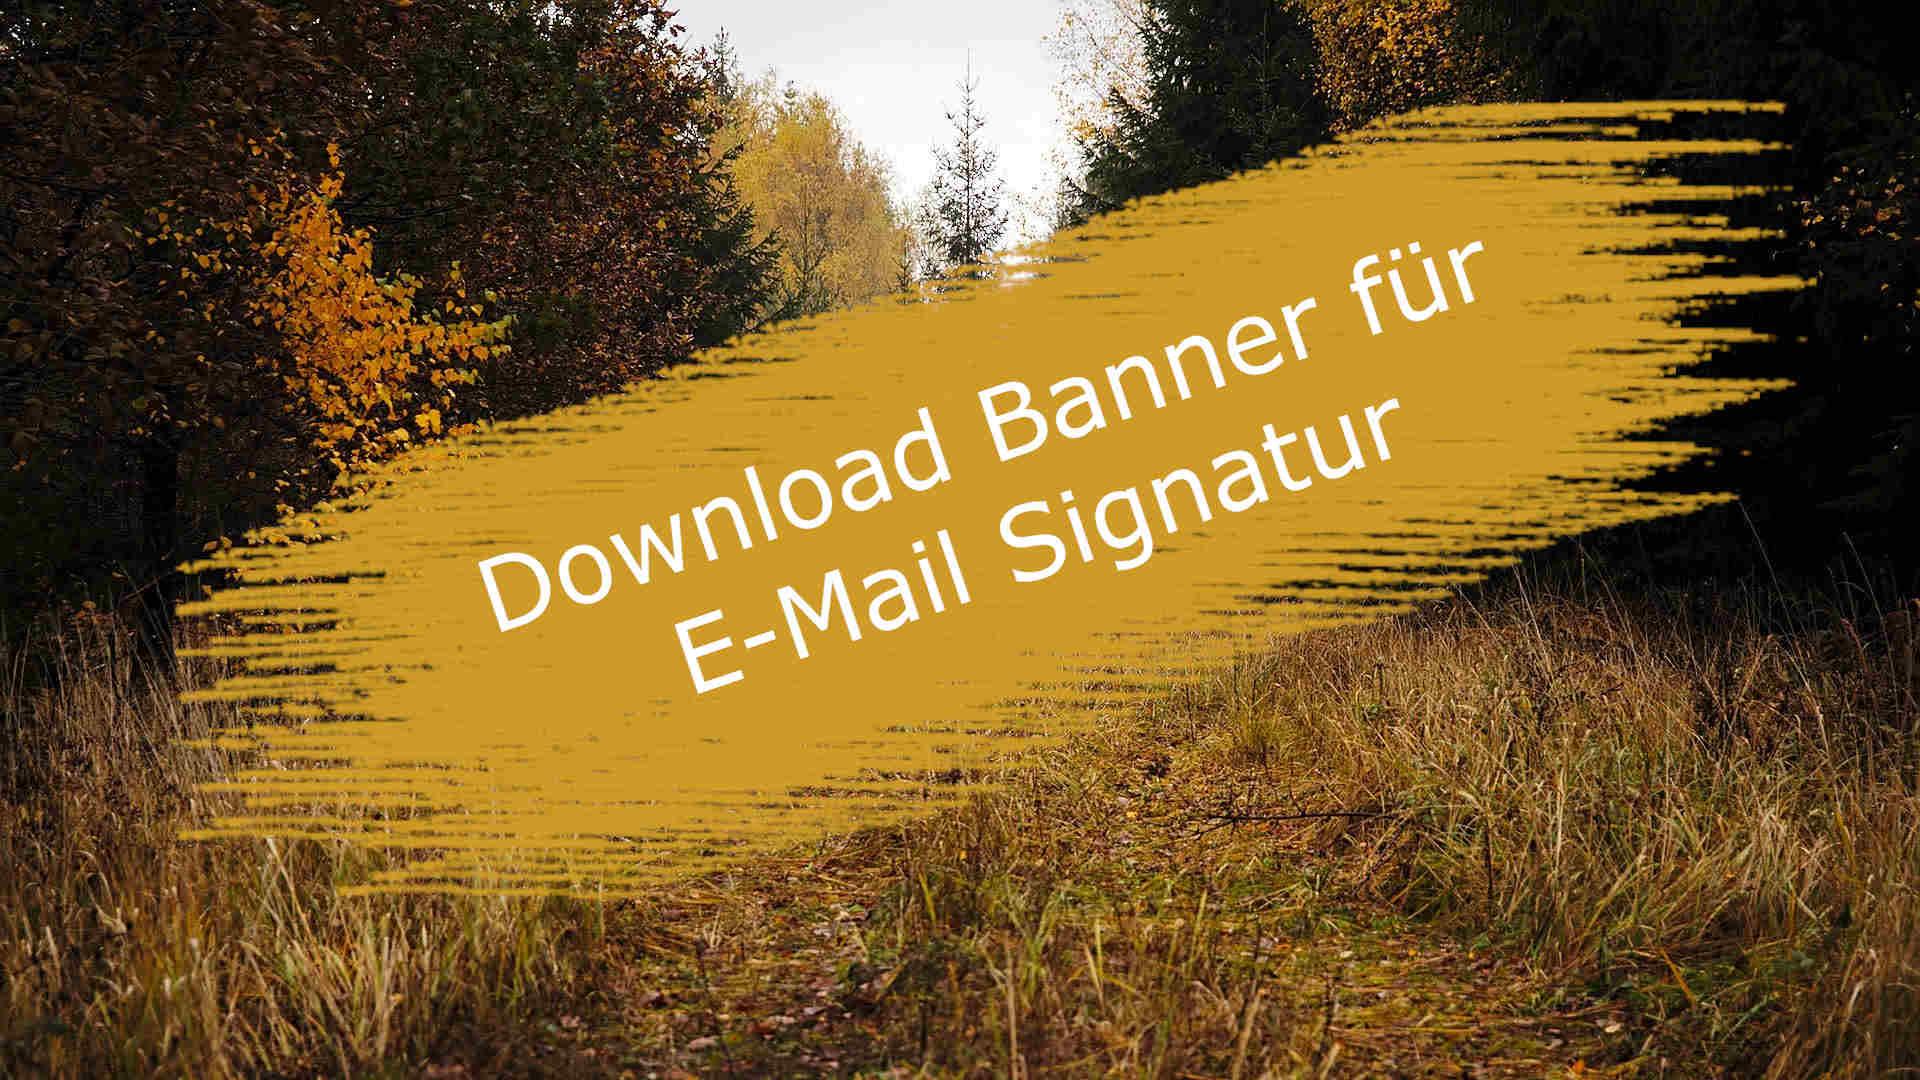 Banner für E-Mail Signatur